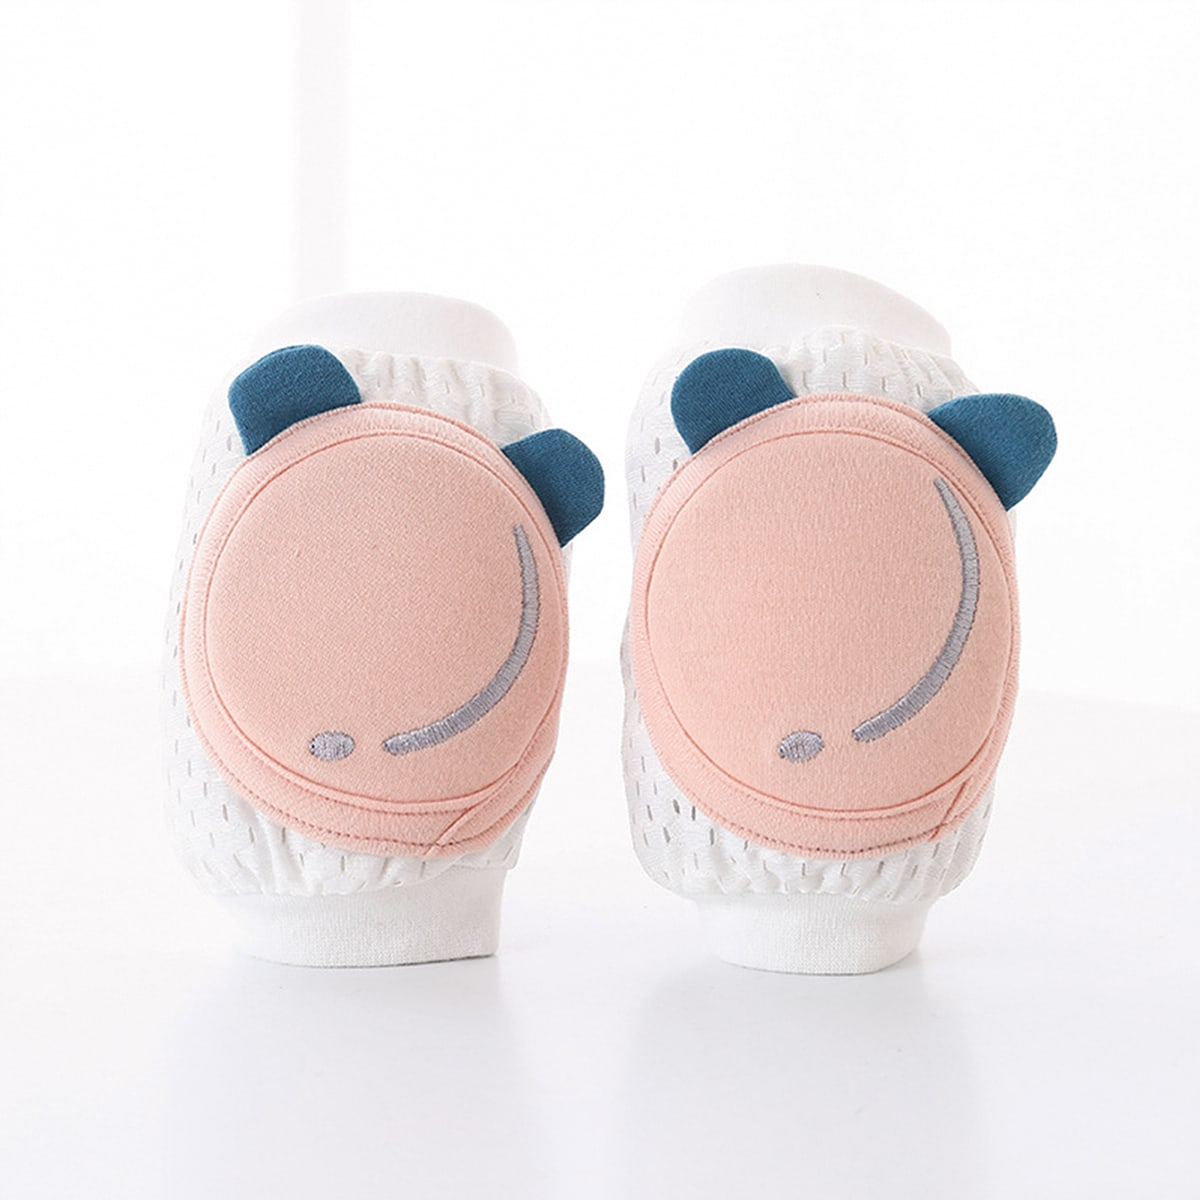 SHEIN / Baby Cartoon Design Knee Pads